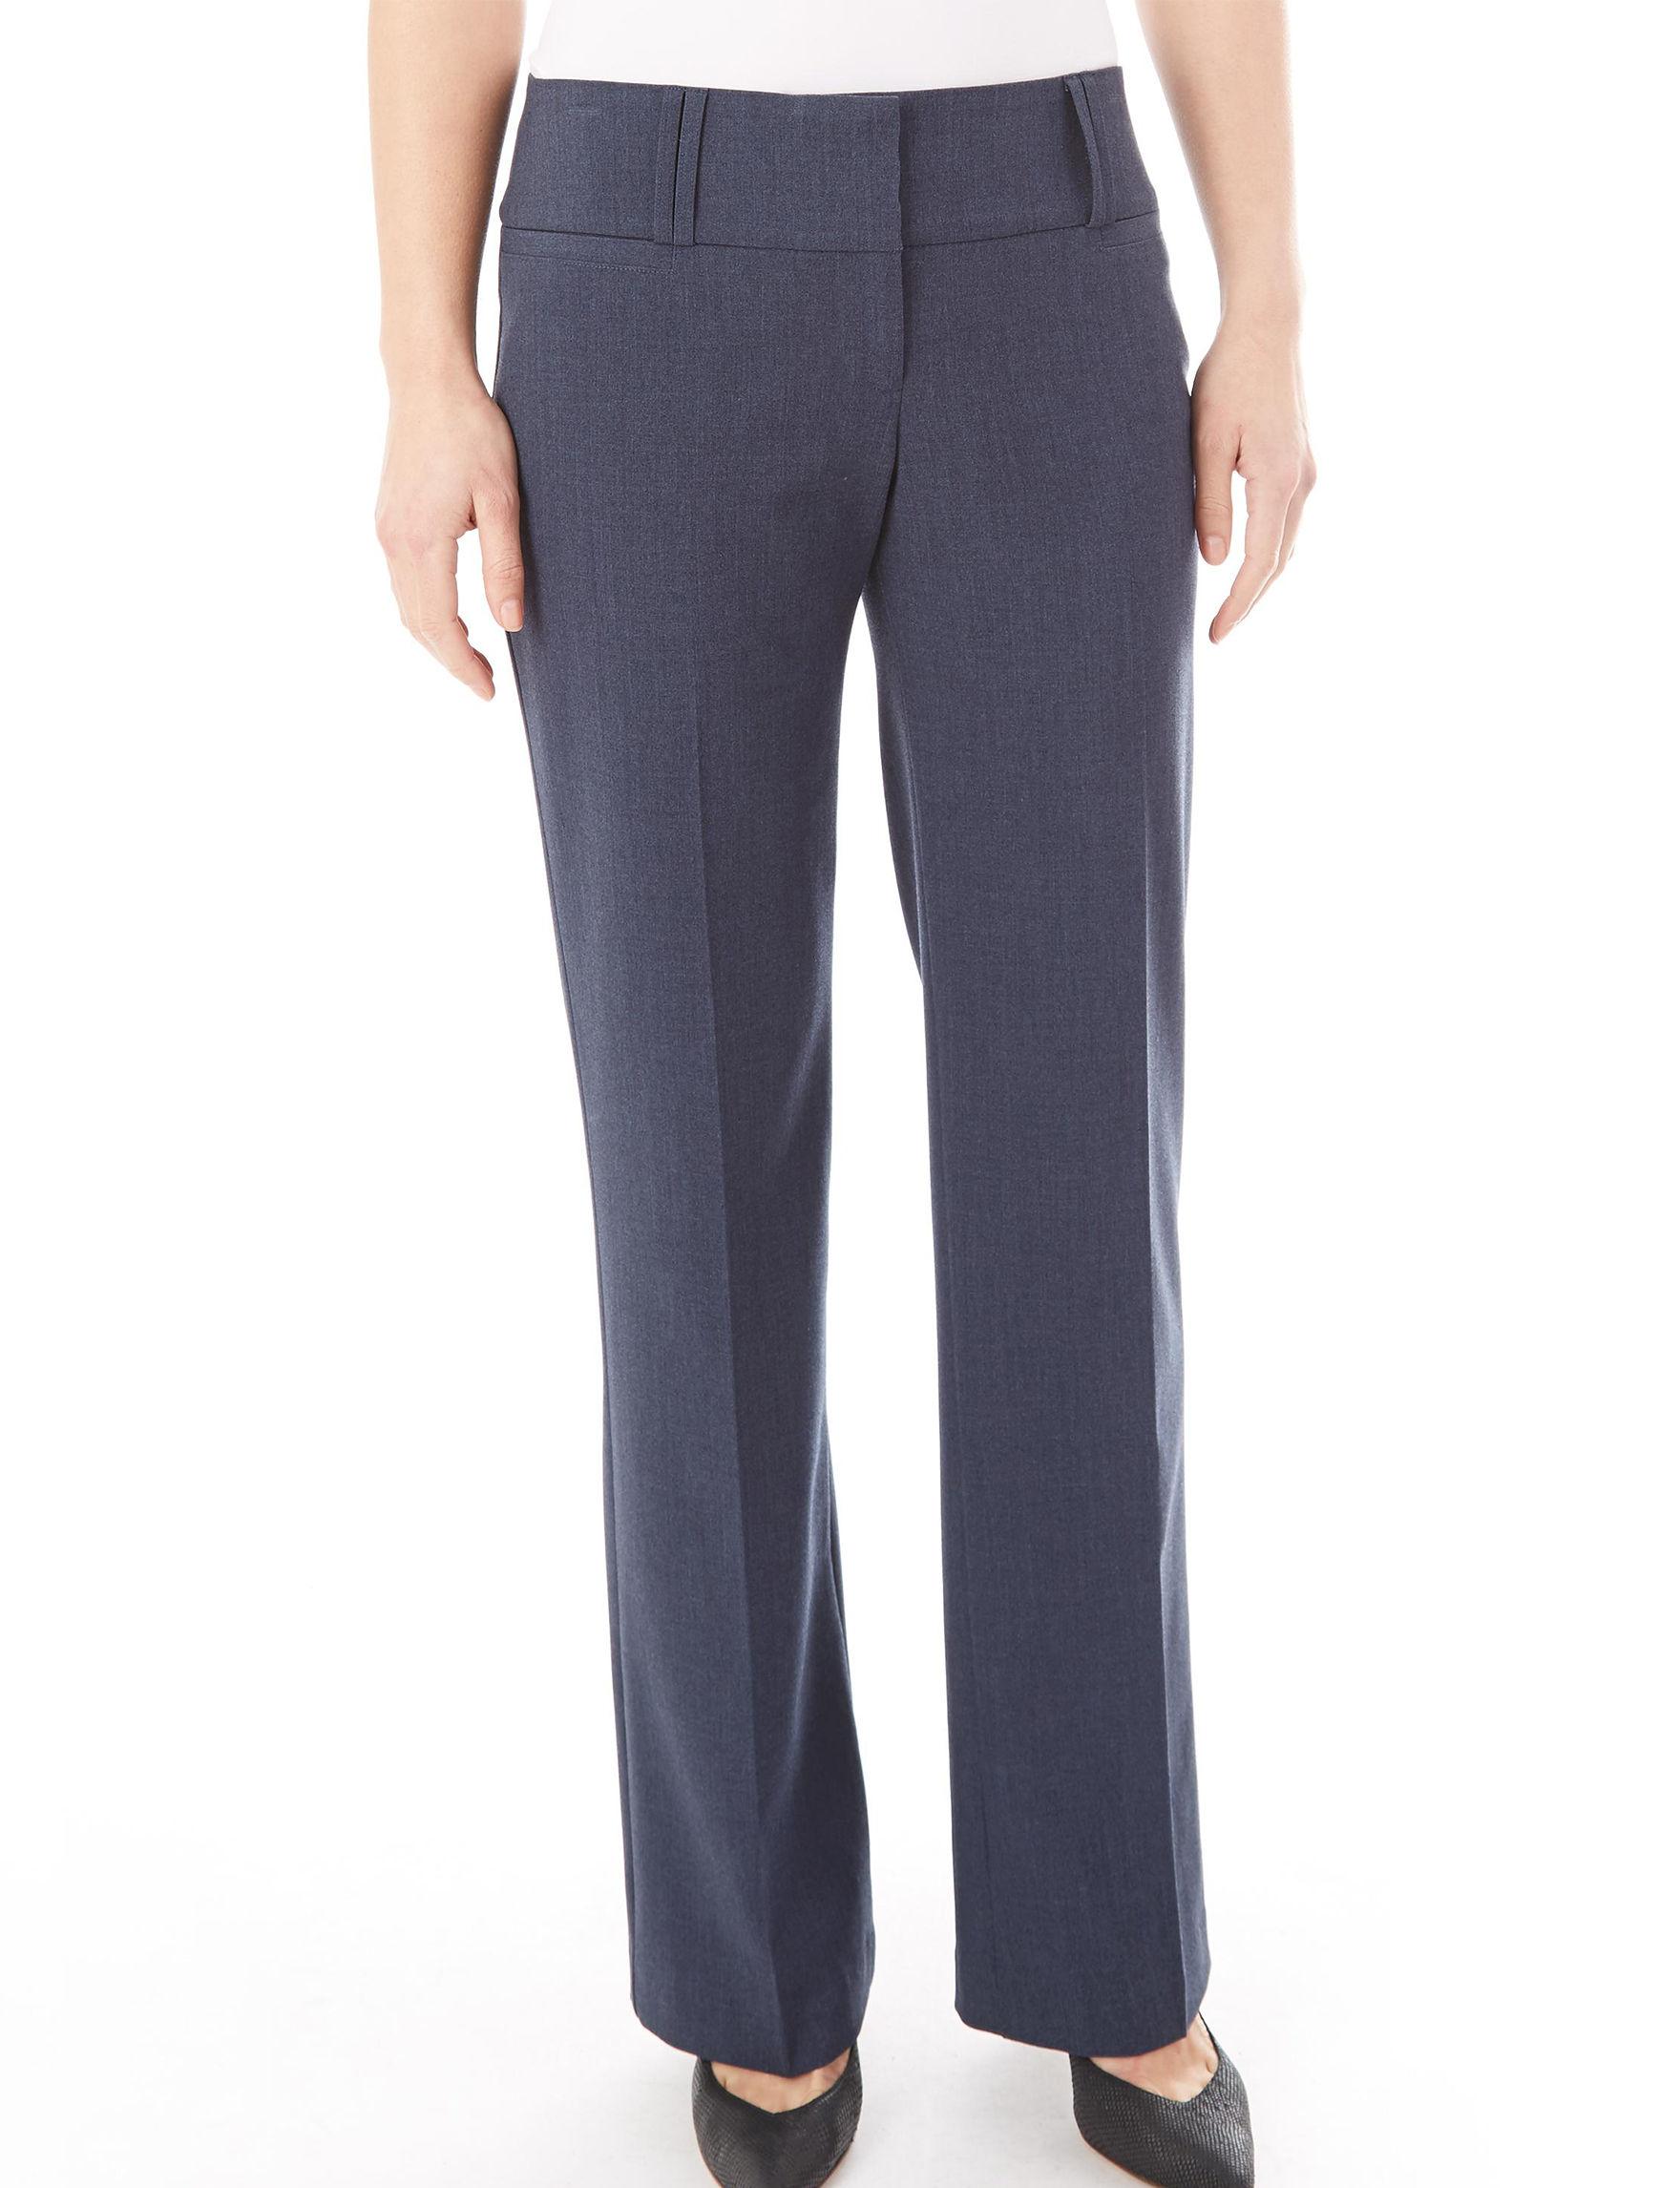 A. Byer Blue Soft Pants